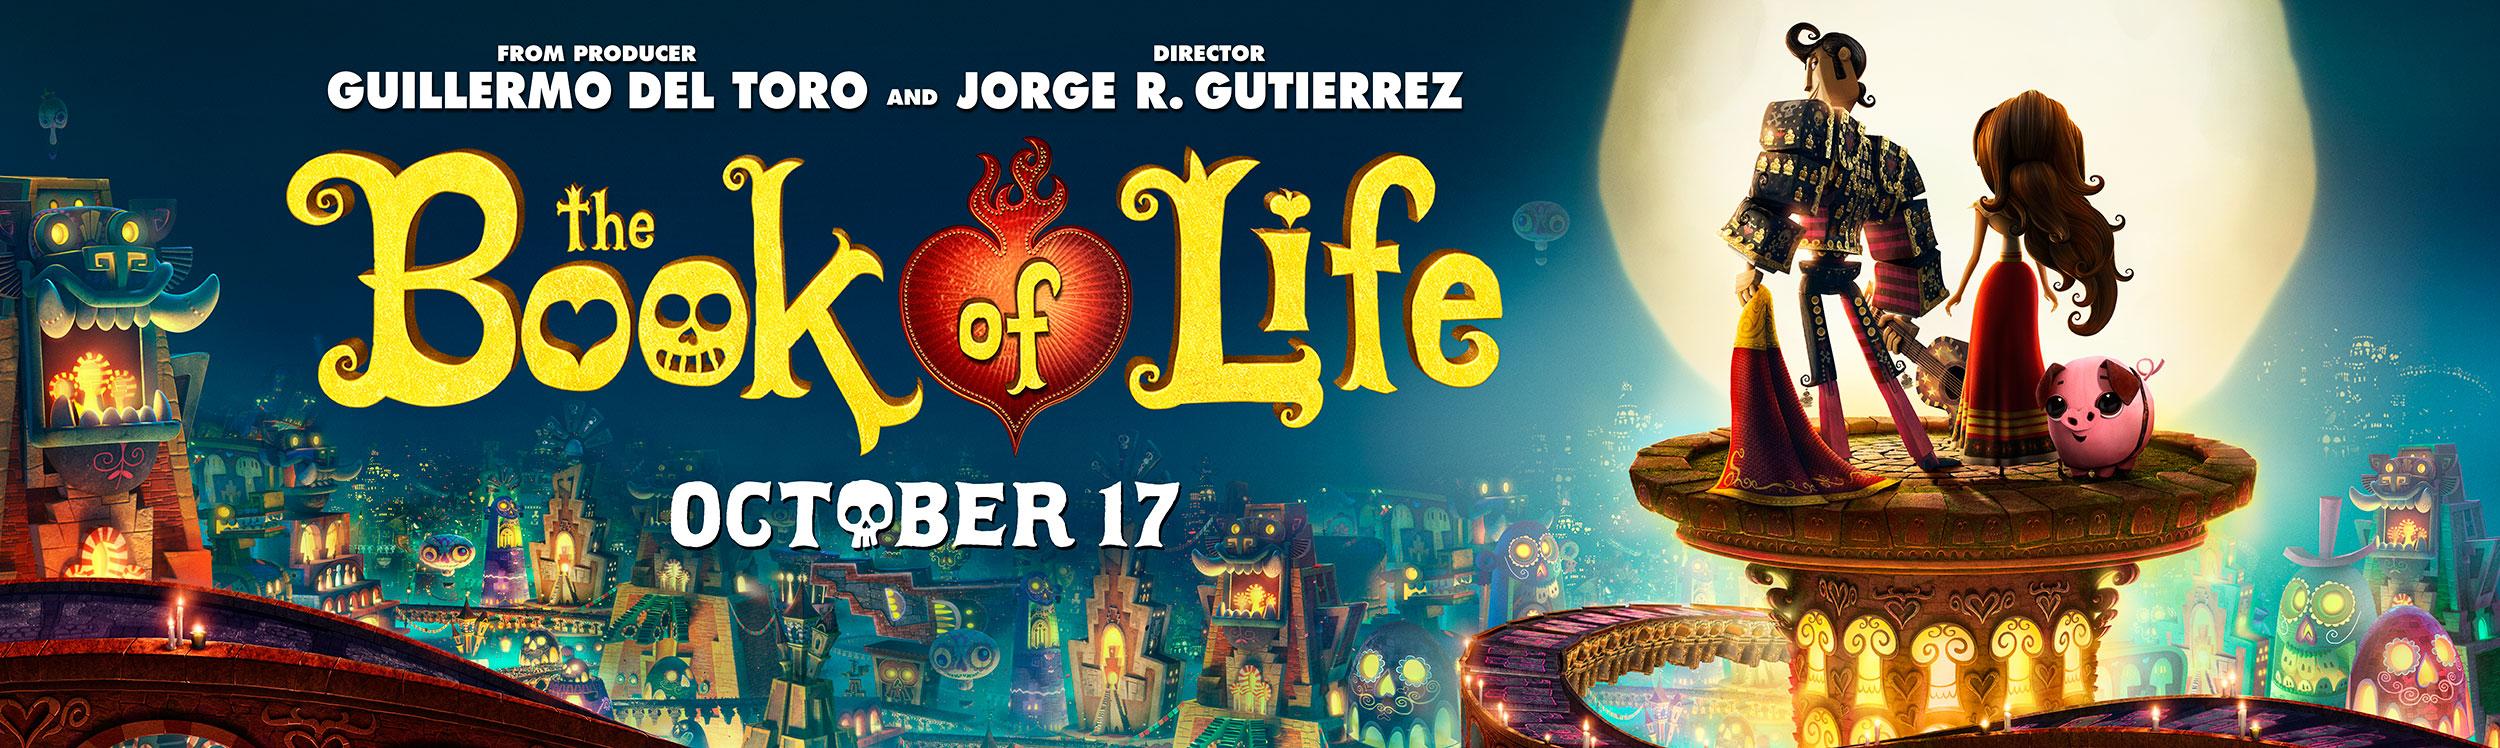 The Book of Life Billboard